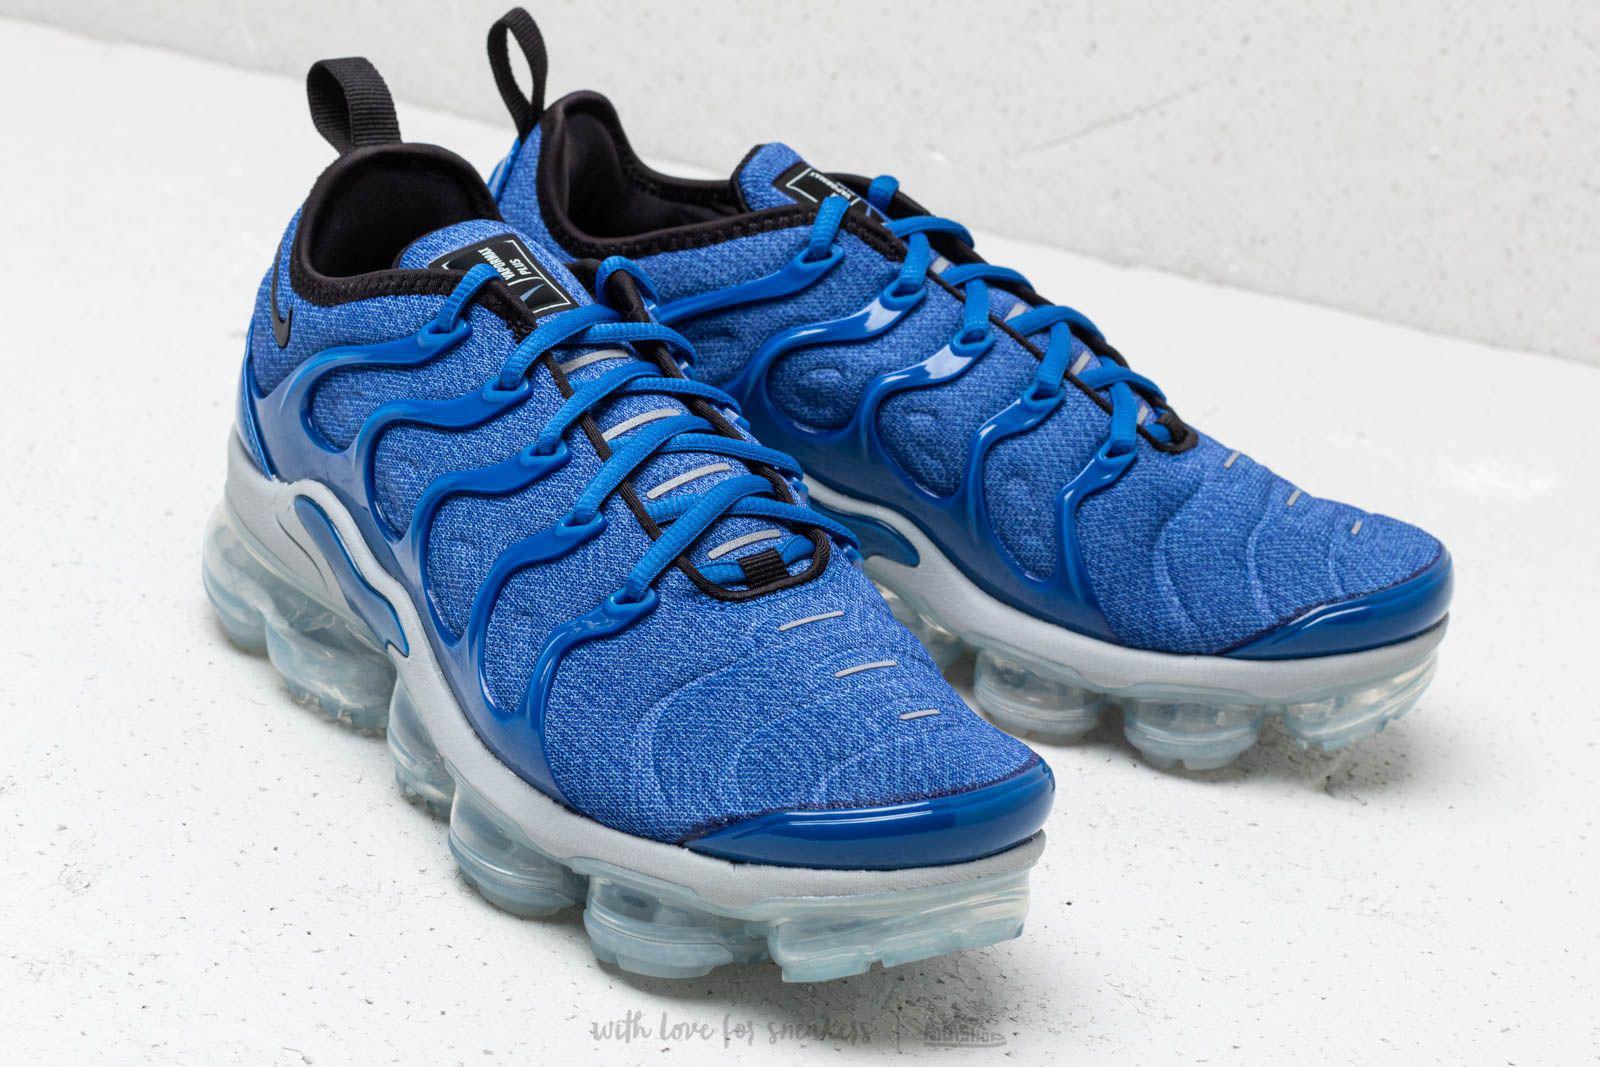 6af4ae6581 Nike Air Vapormax Plus Game Royal/ Black-wolf Grey in Blue for Men ...